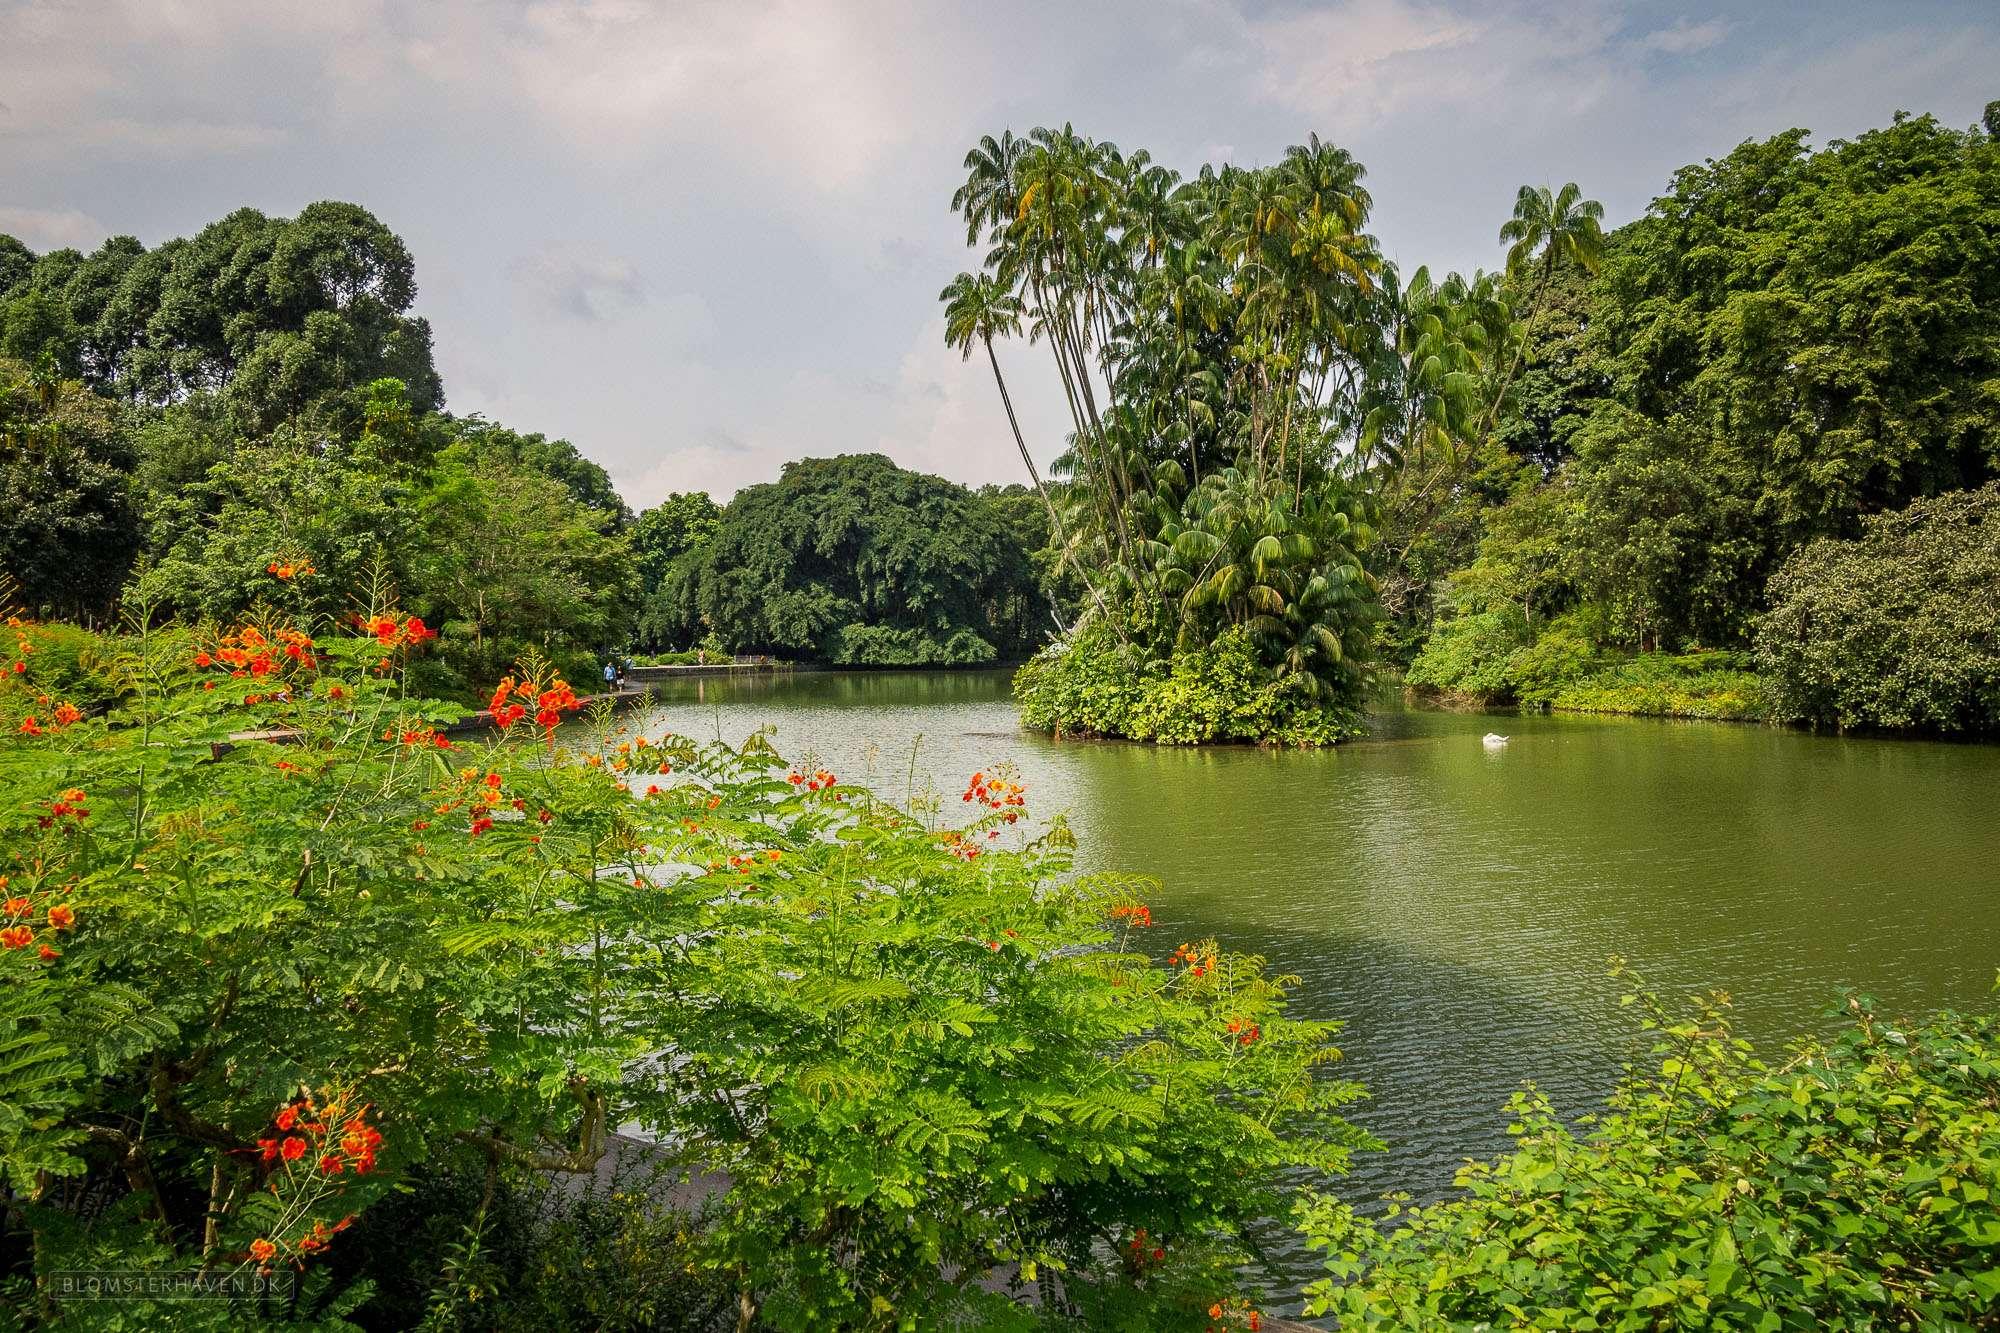 The Swan Lake i Singapore Botanic Gardens